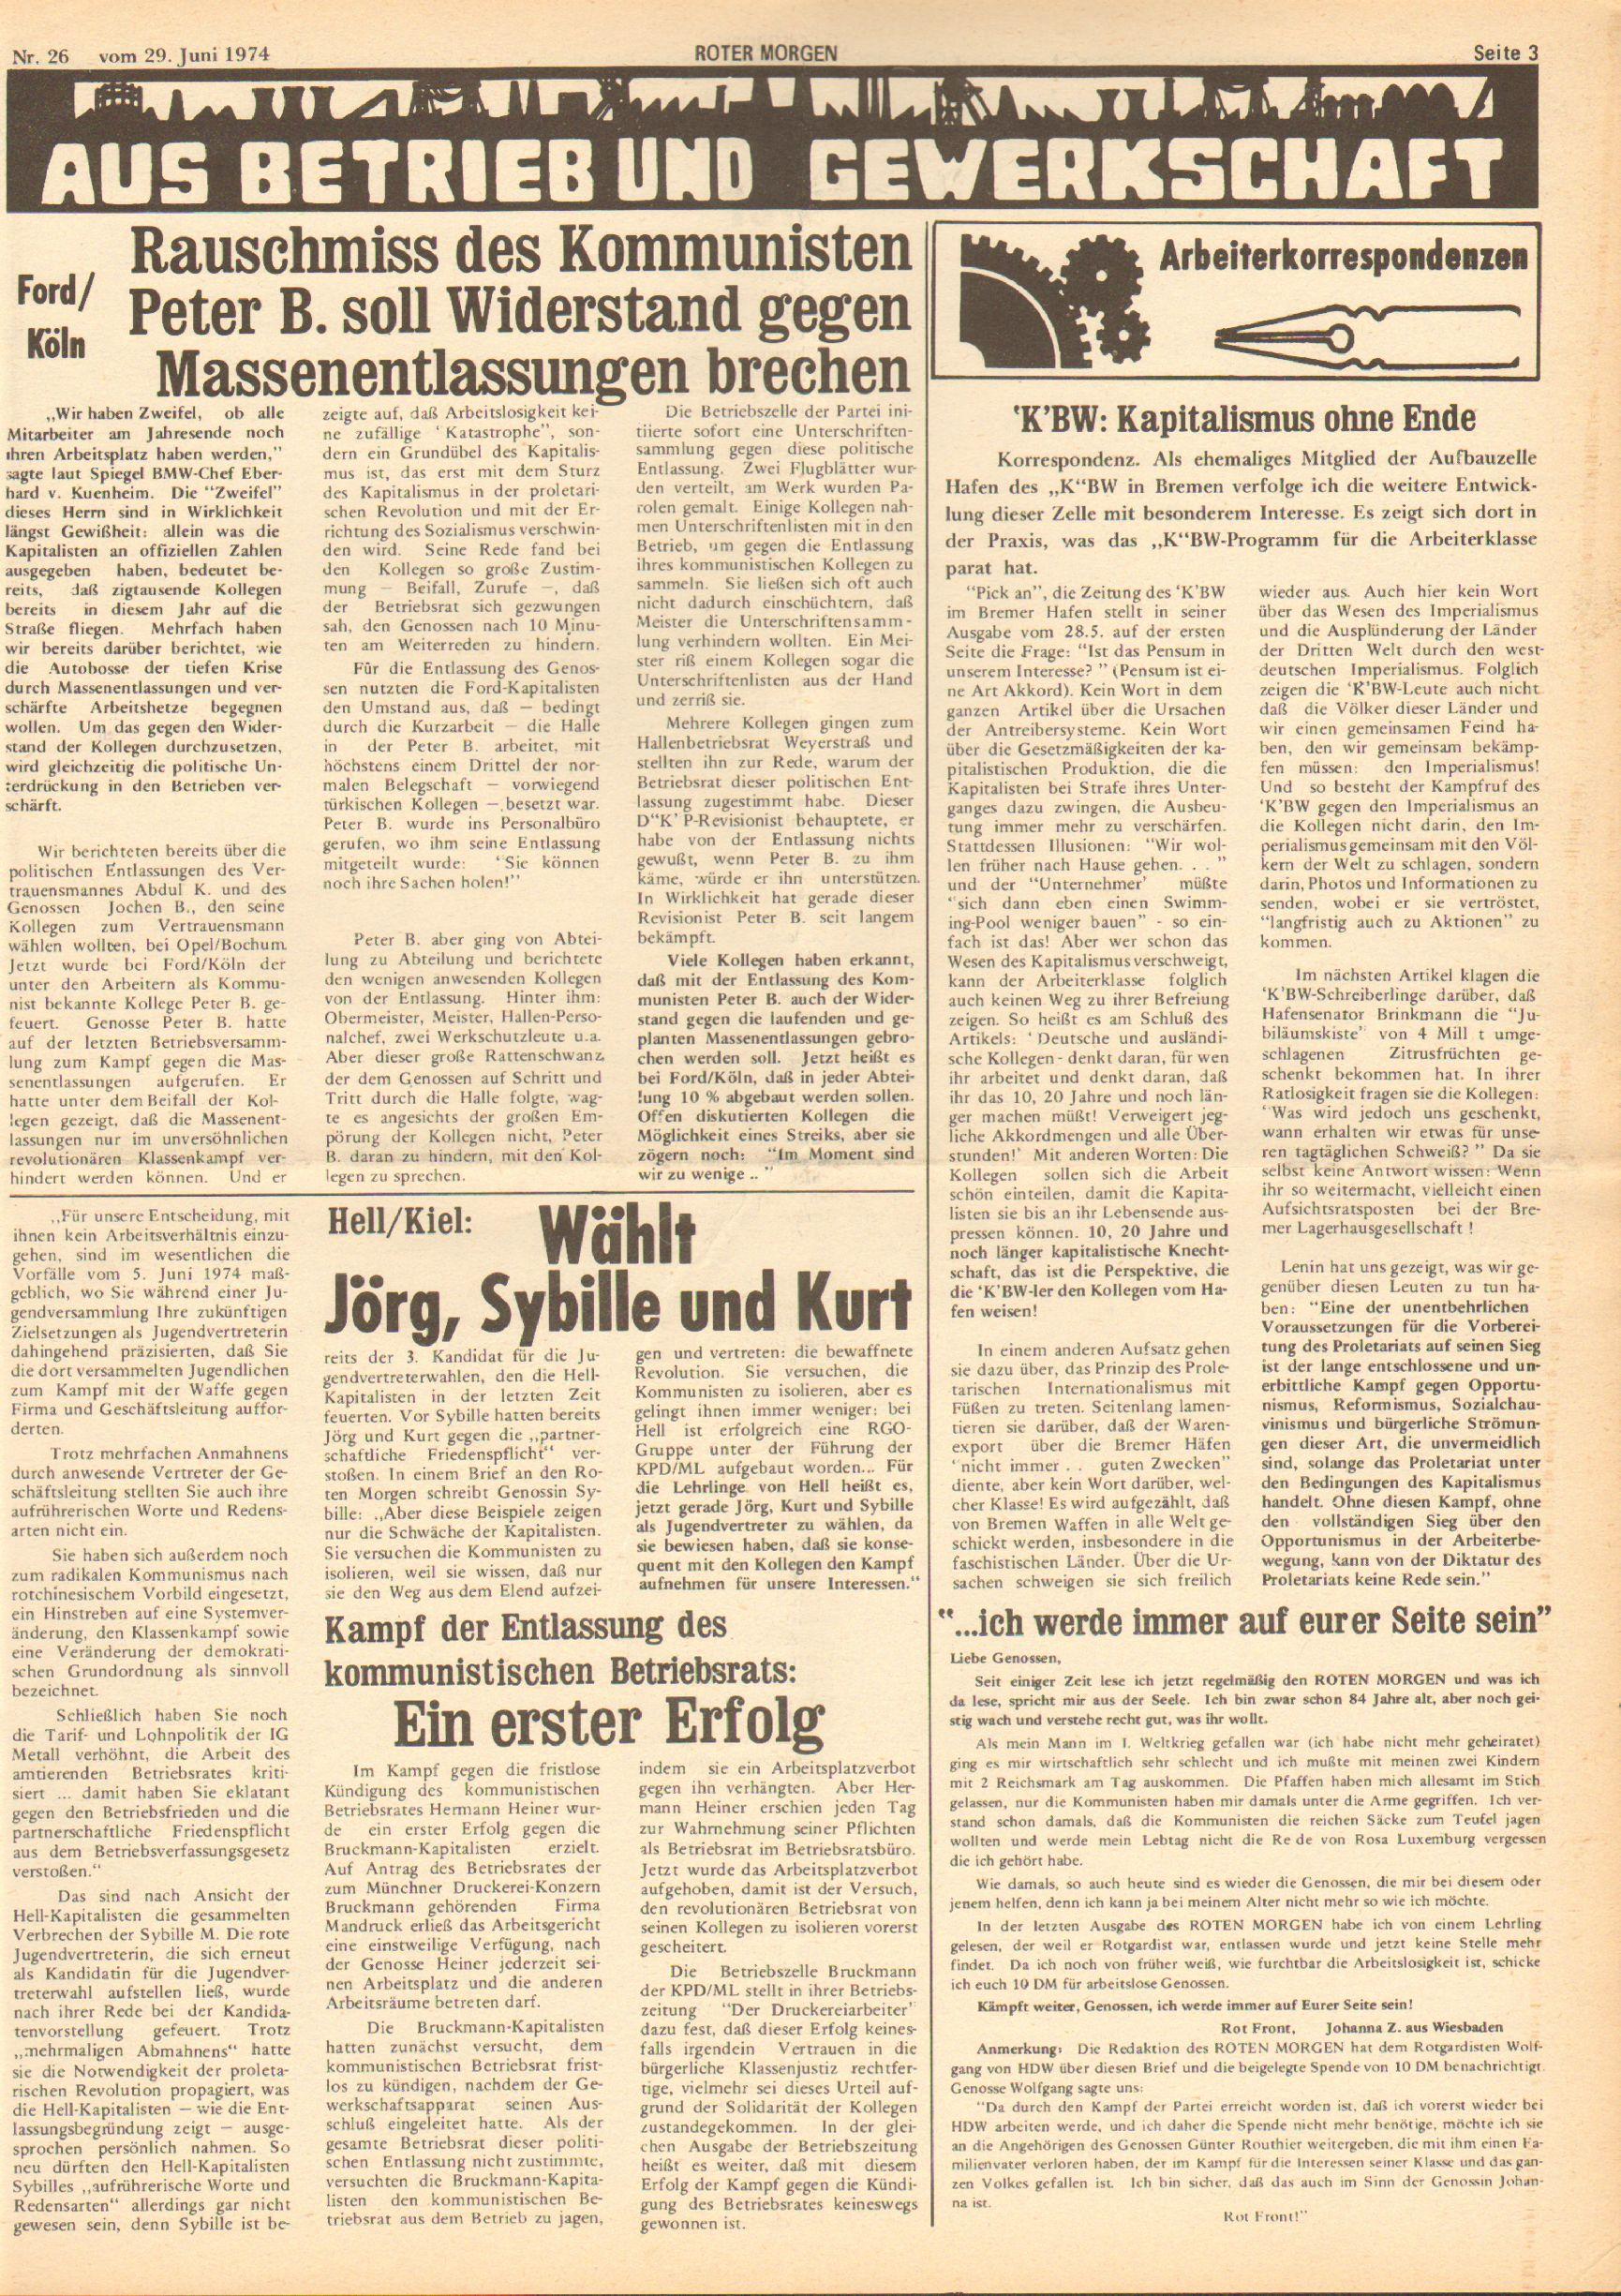 Roter Morgen, 8. Jg., 29. Juni 1974, Nr. 26, Seite 3